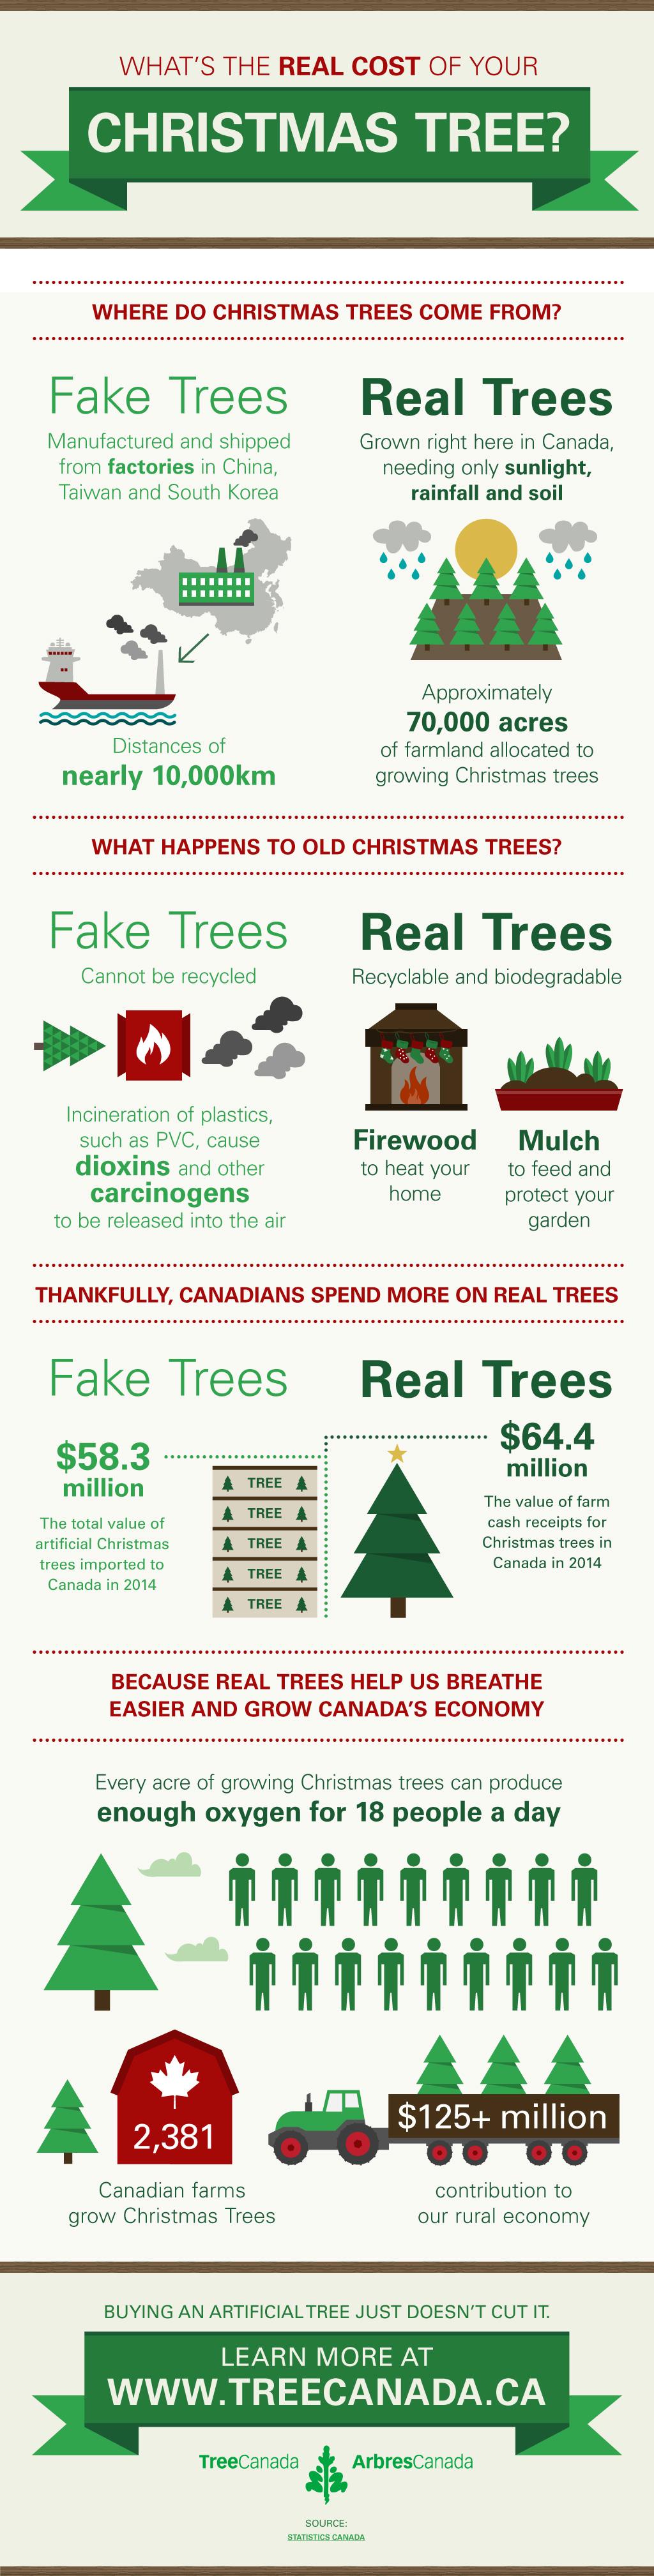 Real Christmas Trees Help Keep Canada's Economy Growing